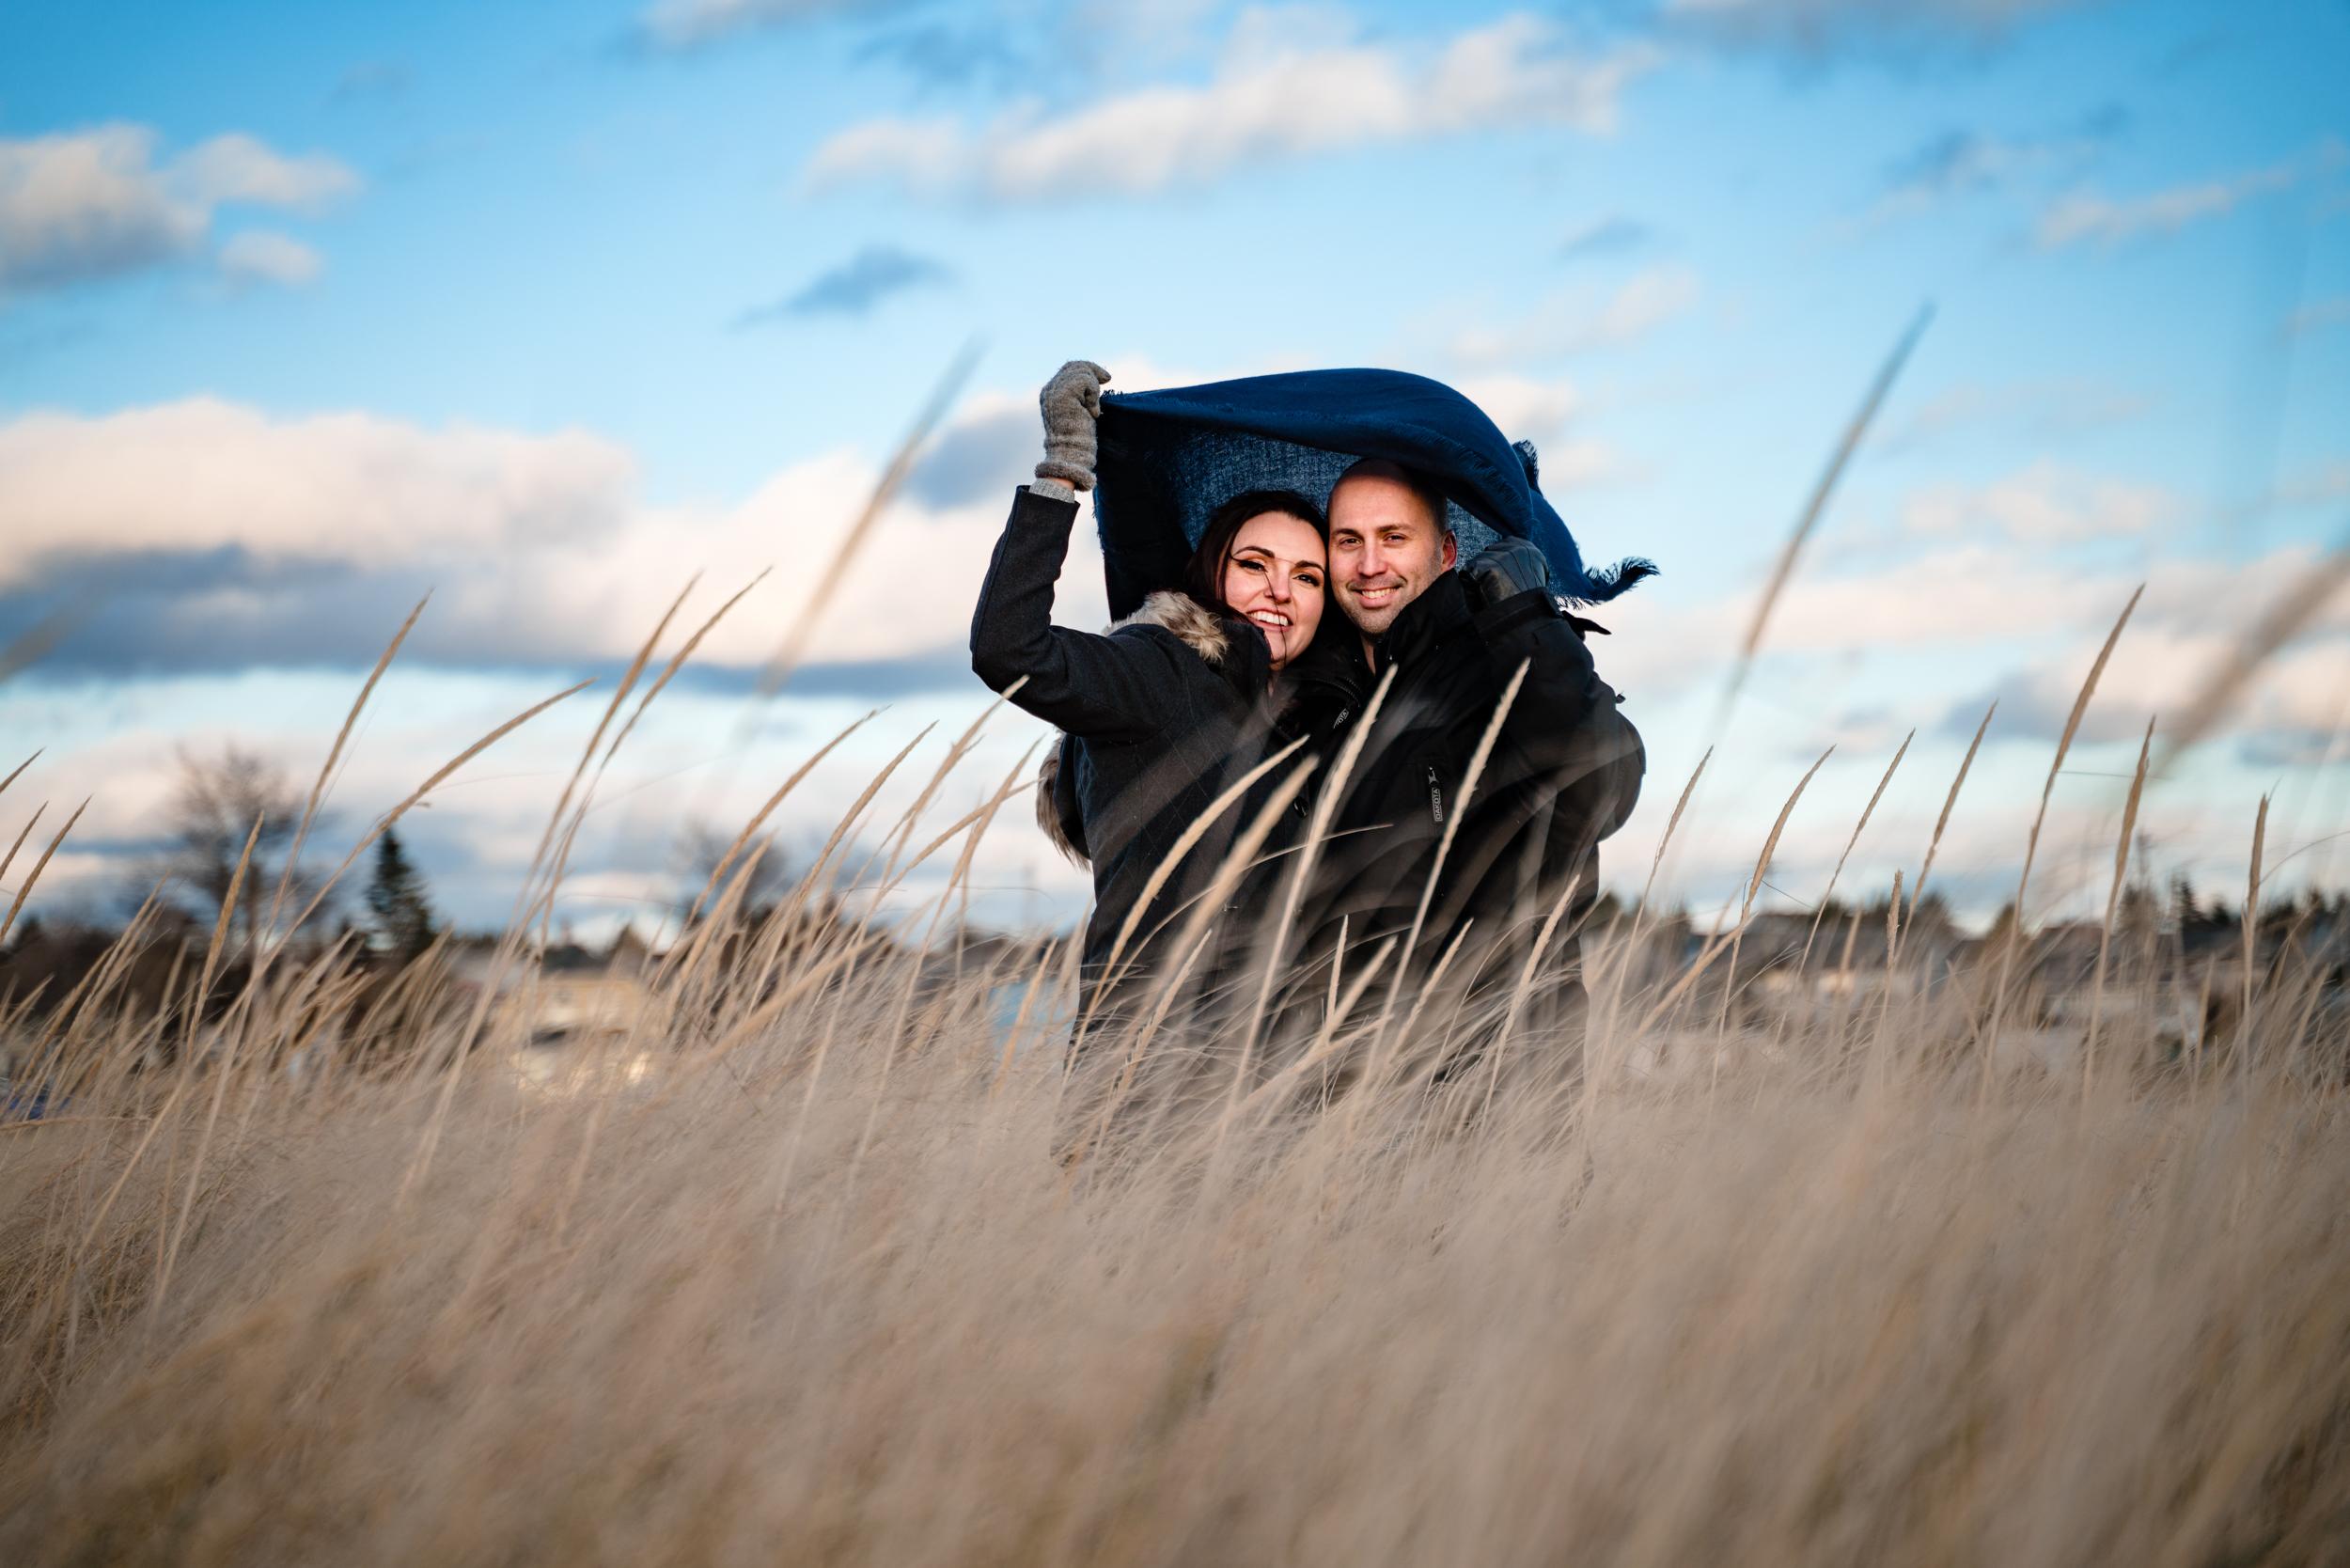 Sarah&Shayne-Halifax-engagement-weddingphotography-weddingphotographers-novascotia (19 of 41).jpg